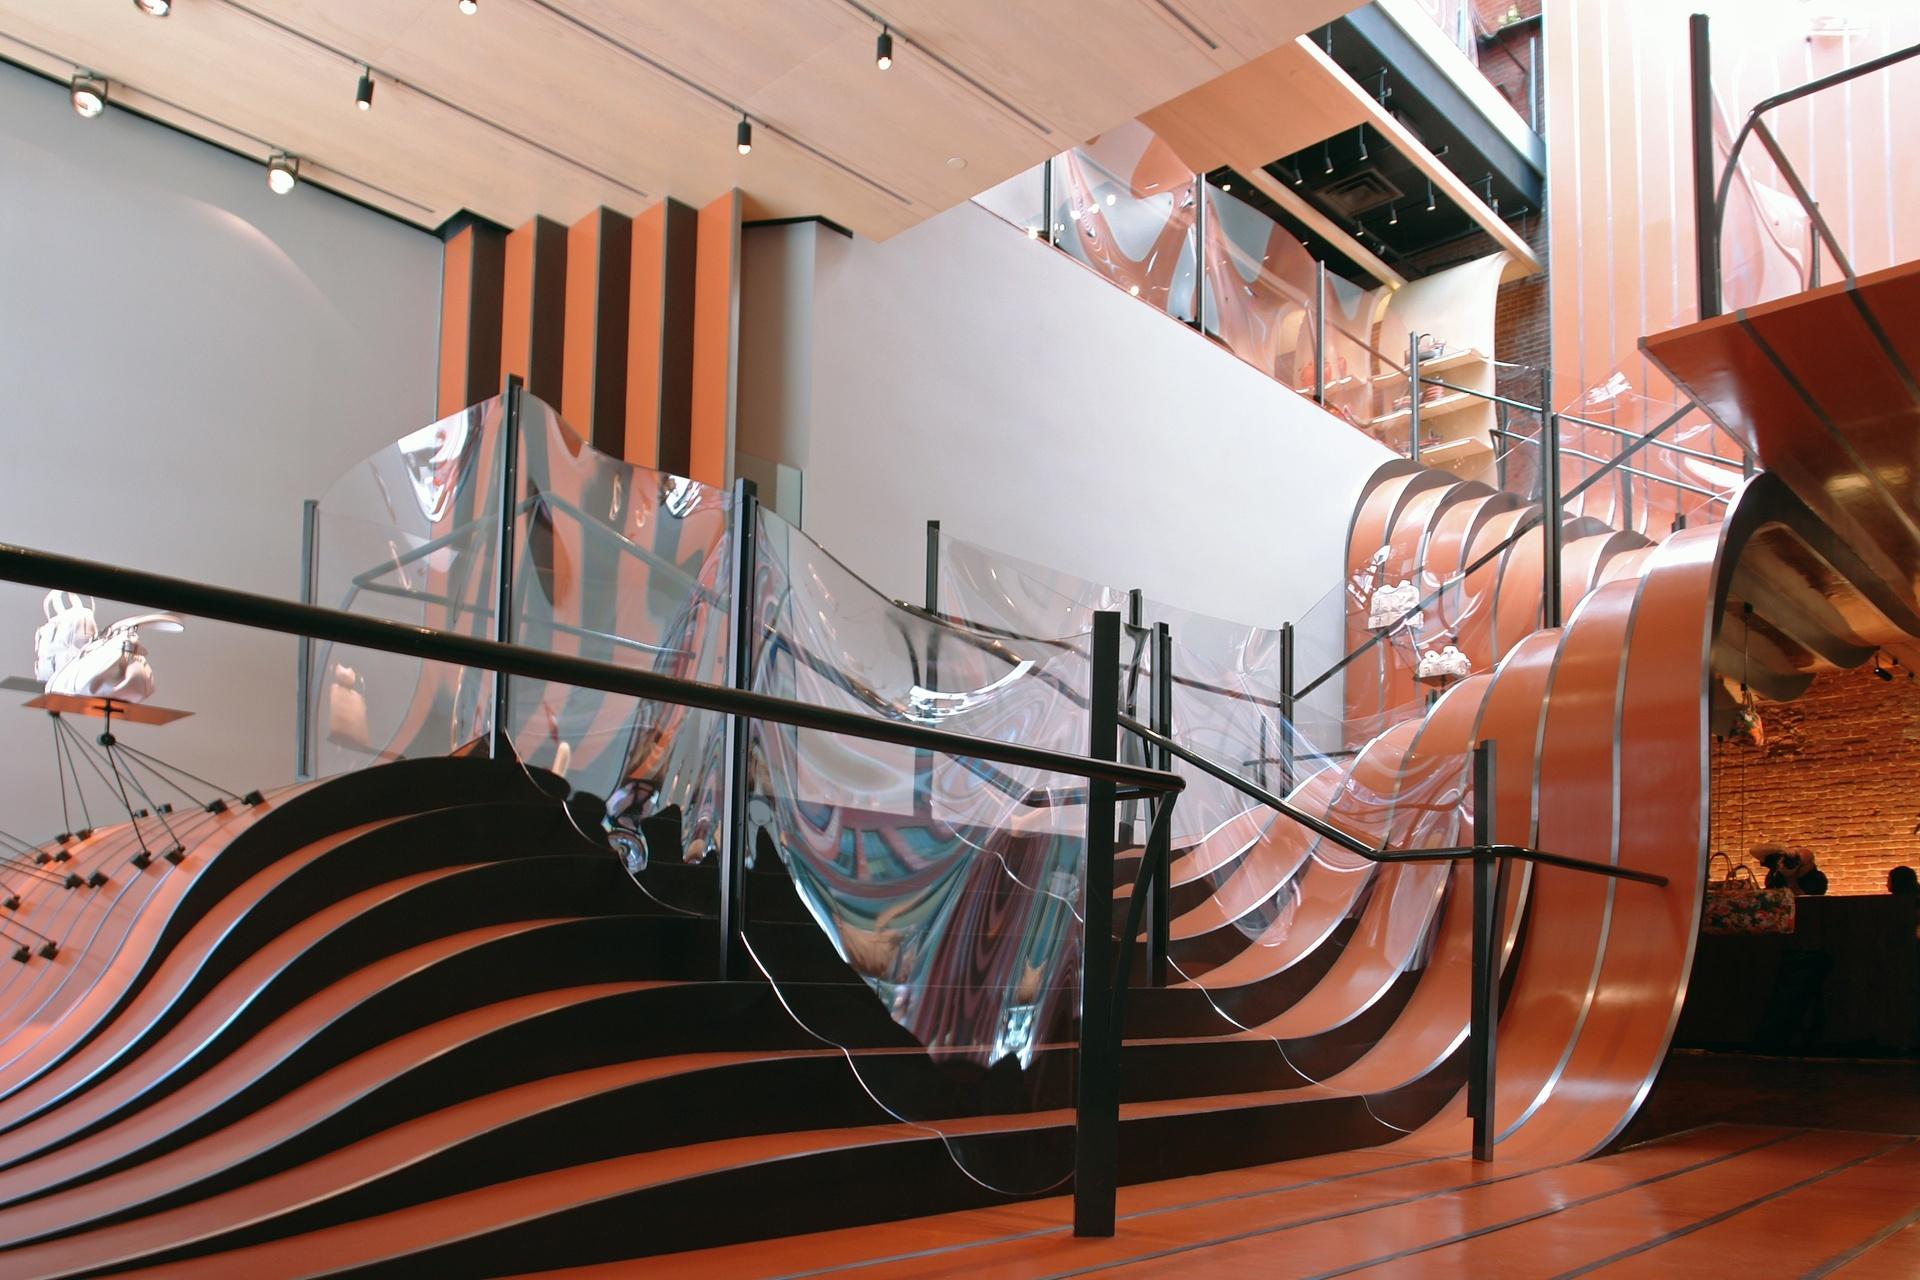 Оранжевая лестница от дизайнера Томаса Хетервика